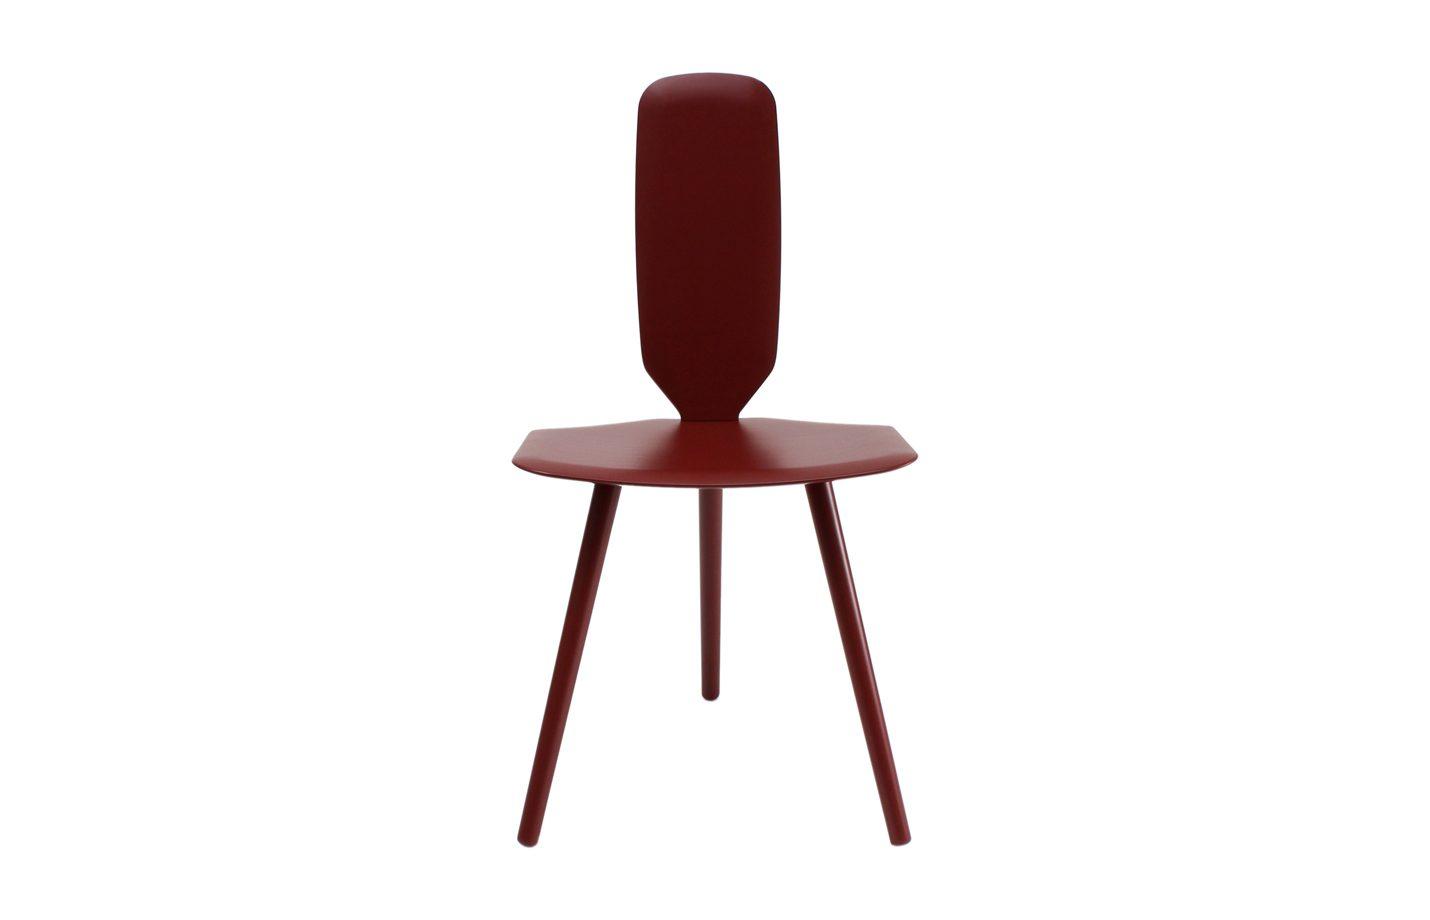 Bavaresk-dining-chair-red